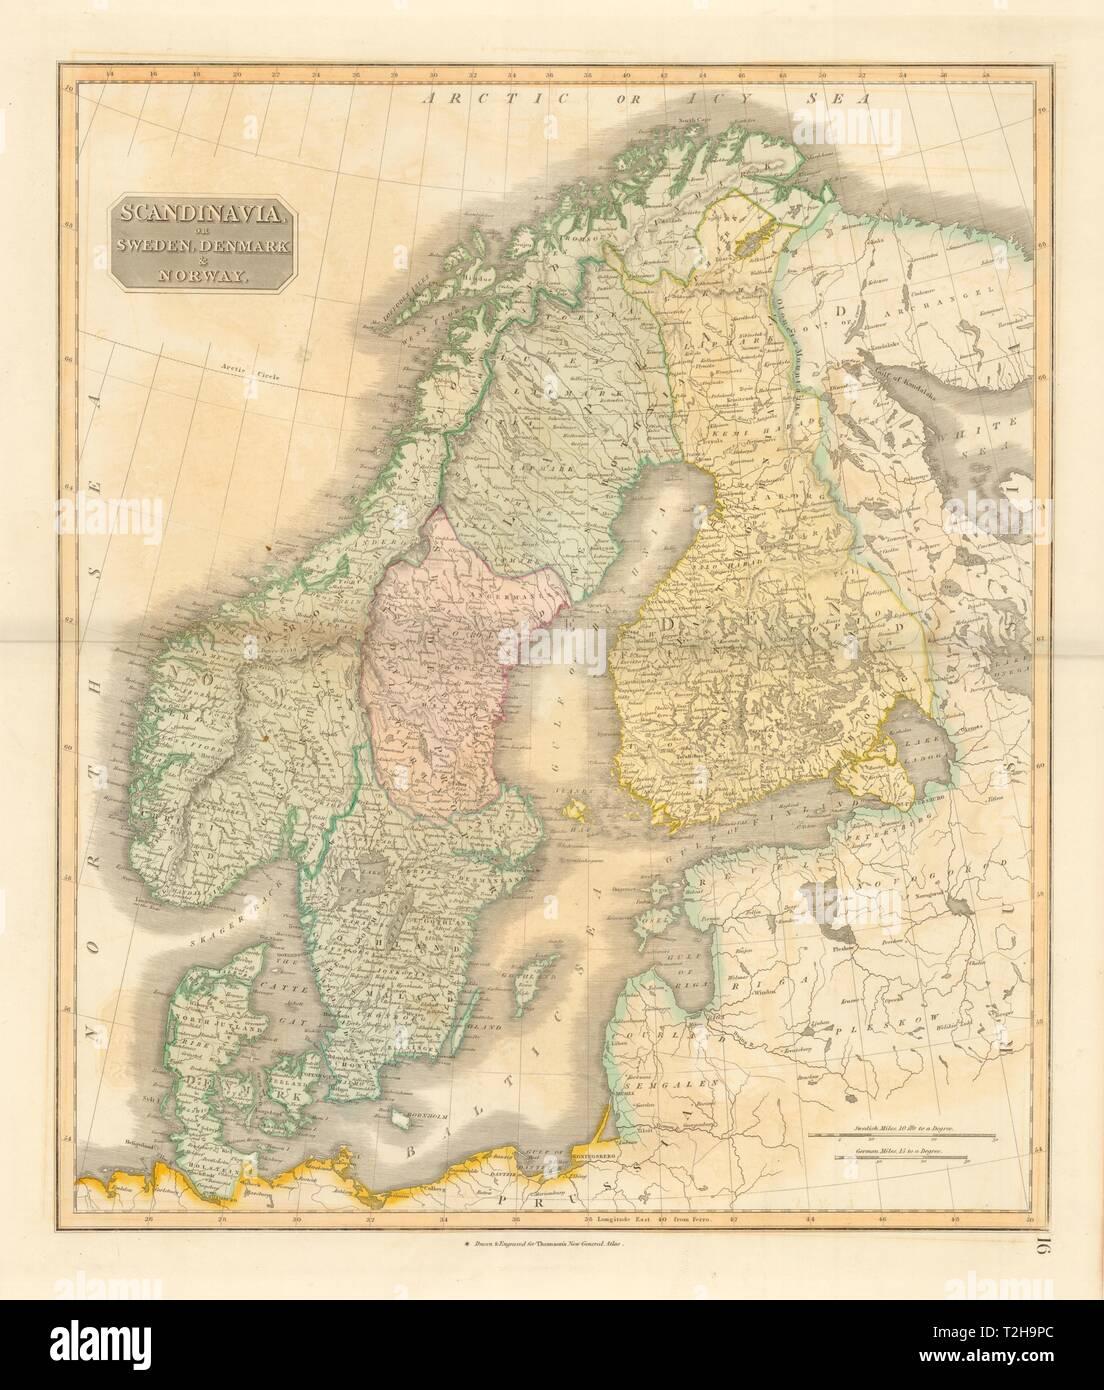 Skandinavien Karte Zum Ausdrucken.Karte Danische Ostsee